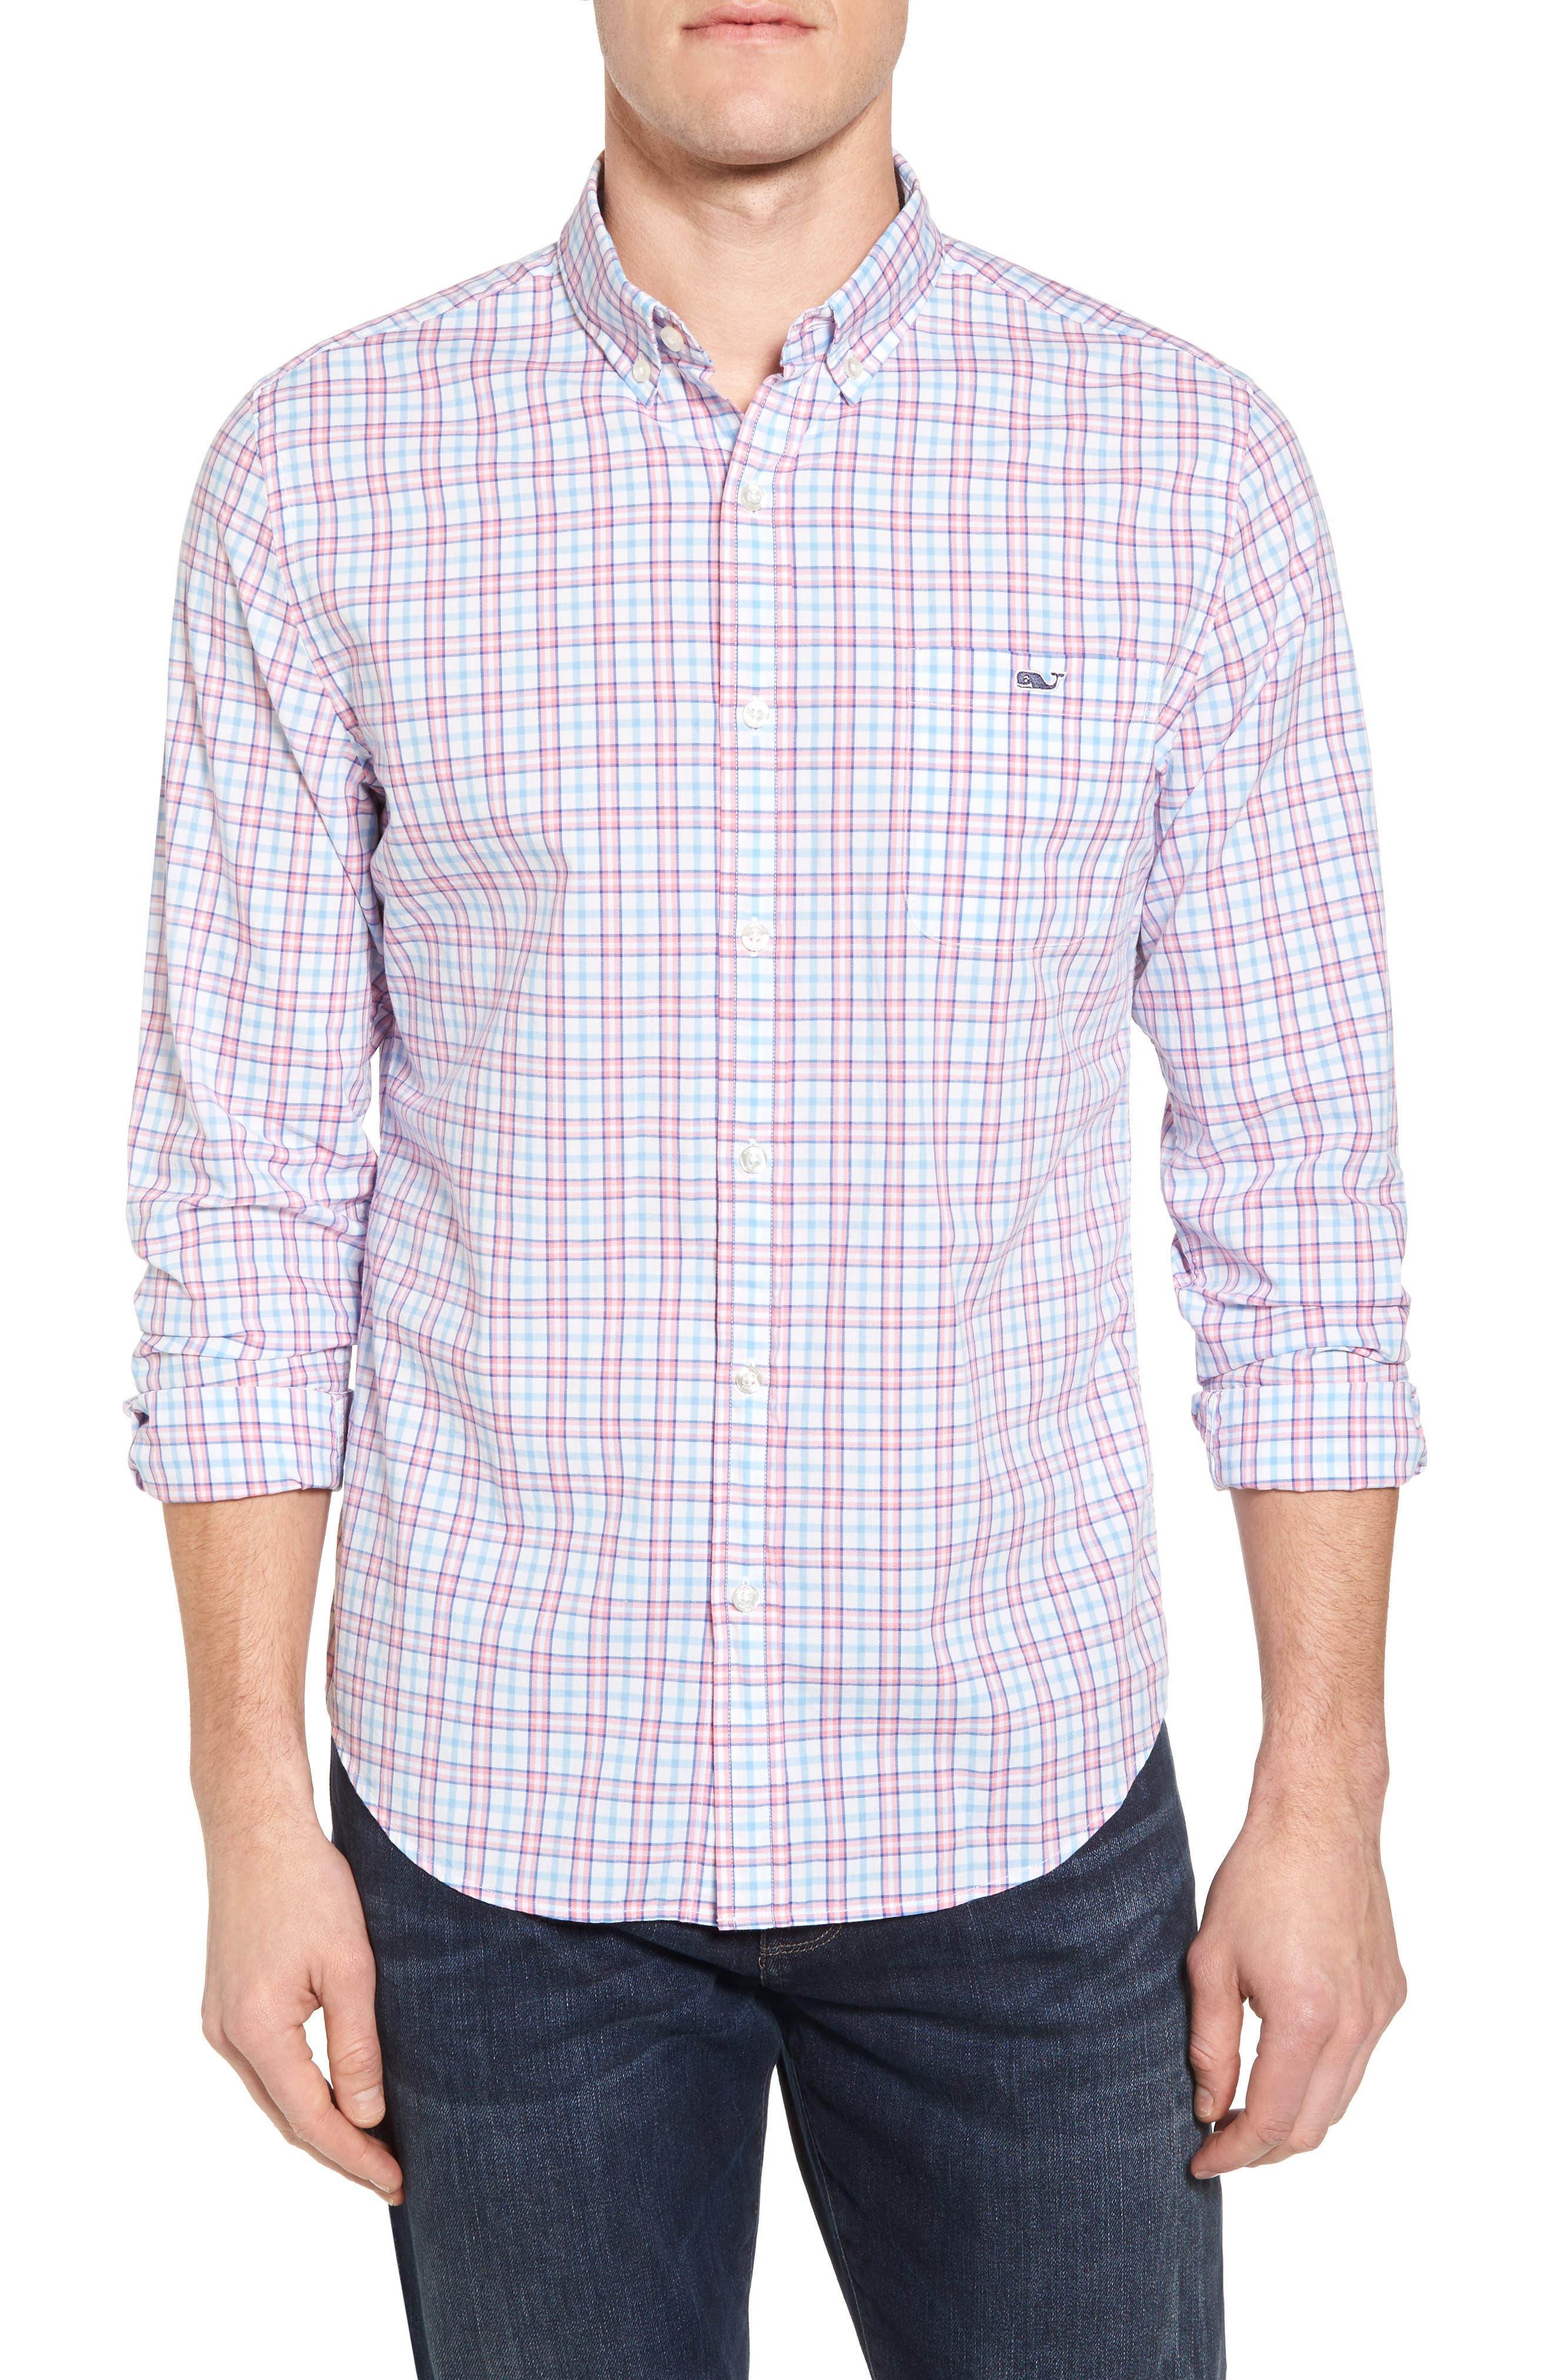 Kennard Tucker Slim Fit Plaid Sport Shirt,                         Main,                         color, 956